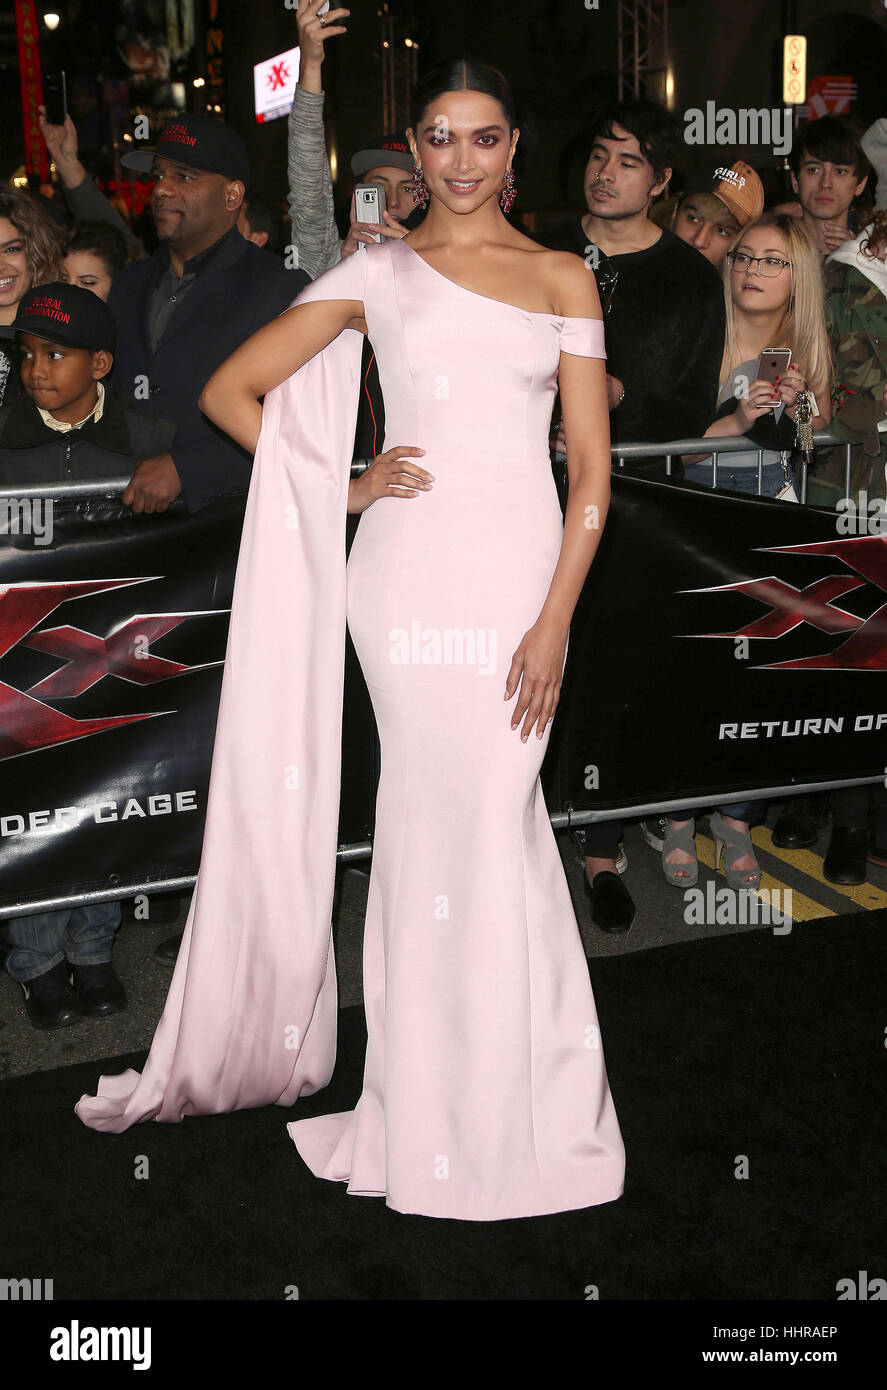 "Hollywood, USA. 19. Januar 2017. Deepika Padukone gesehen, Teilnahme an der ""xXx: Return Of Xander Cage' Los Angeles Stockfoto"